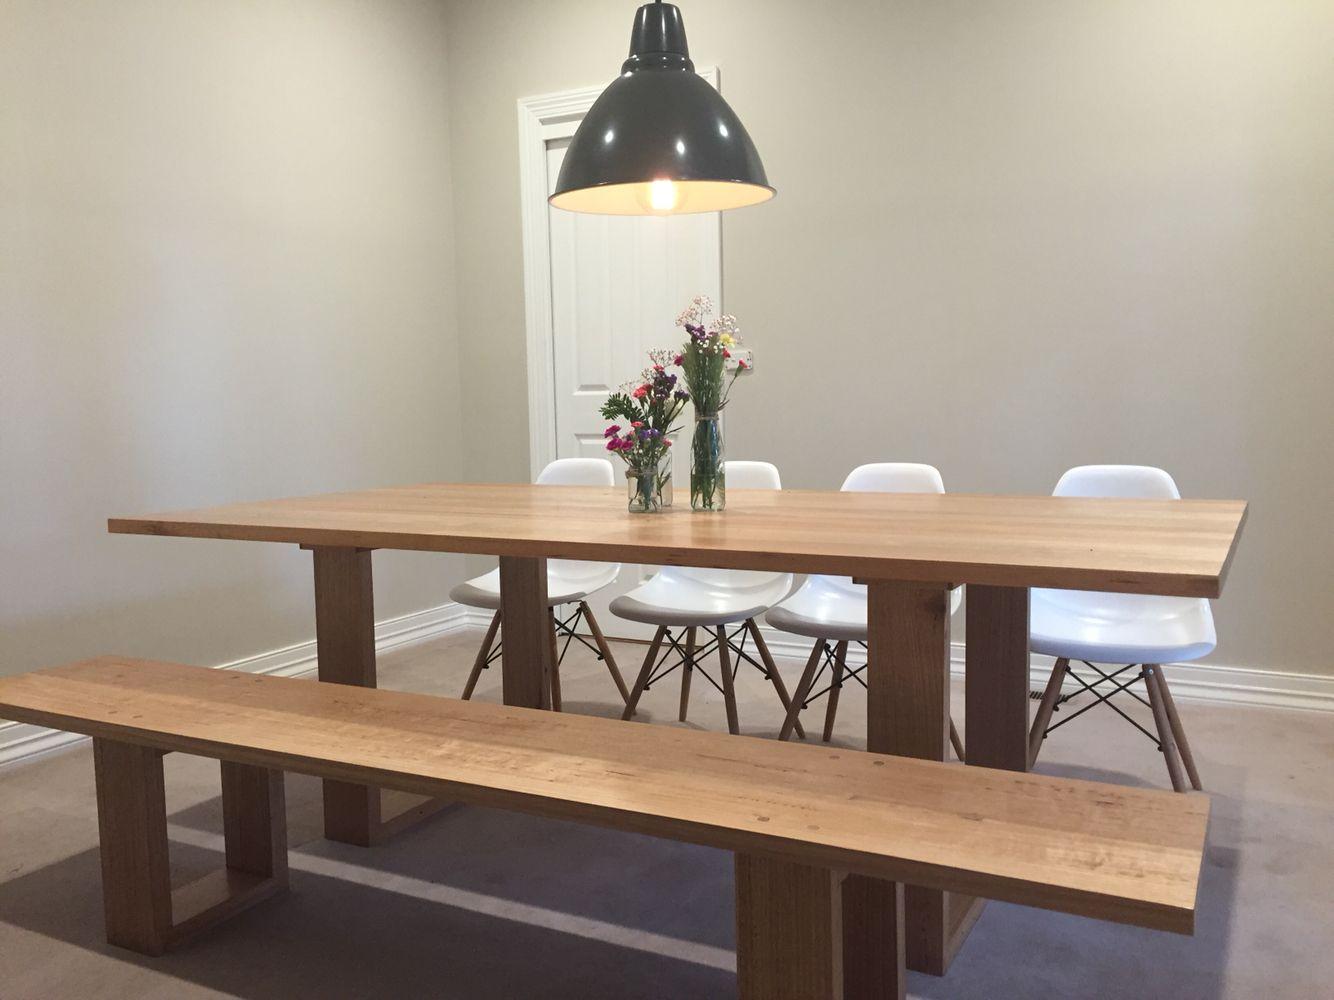 Prime Baxter Blue Co Melbourne Mountain Ash Dining Table Forskolin Free Trial Chair Design Images Forskolin Free Trialorg